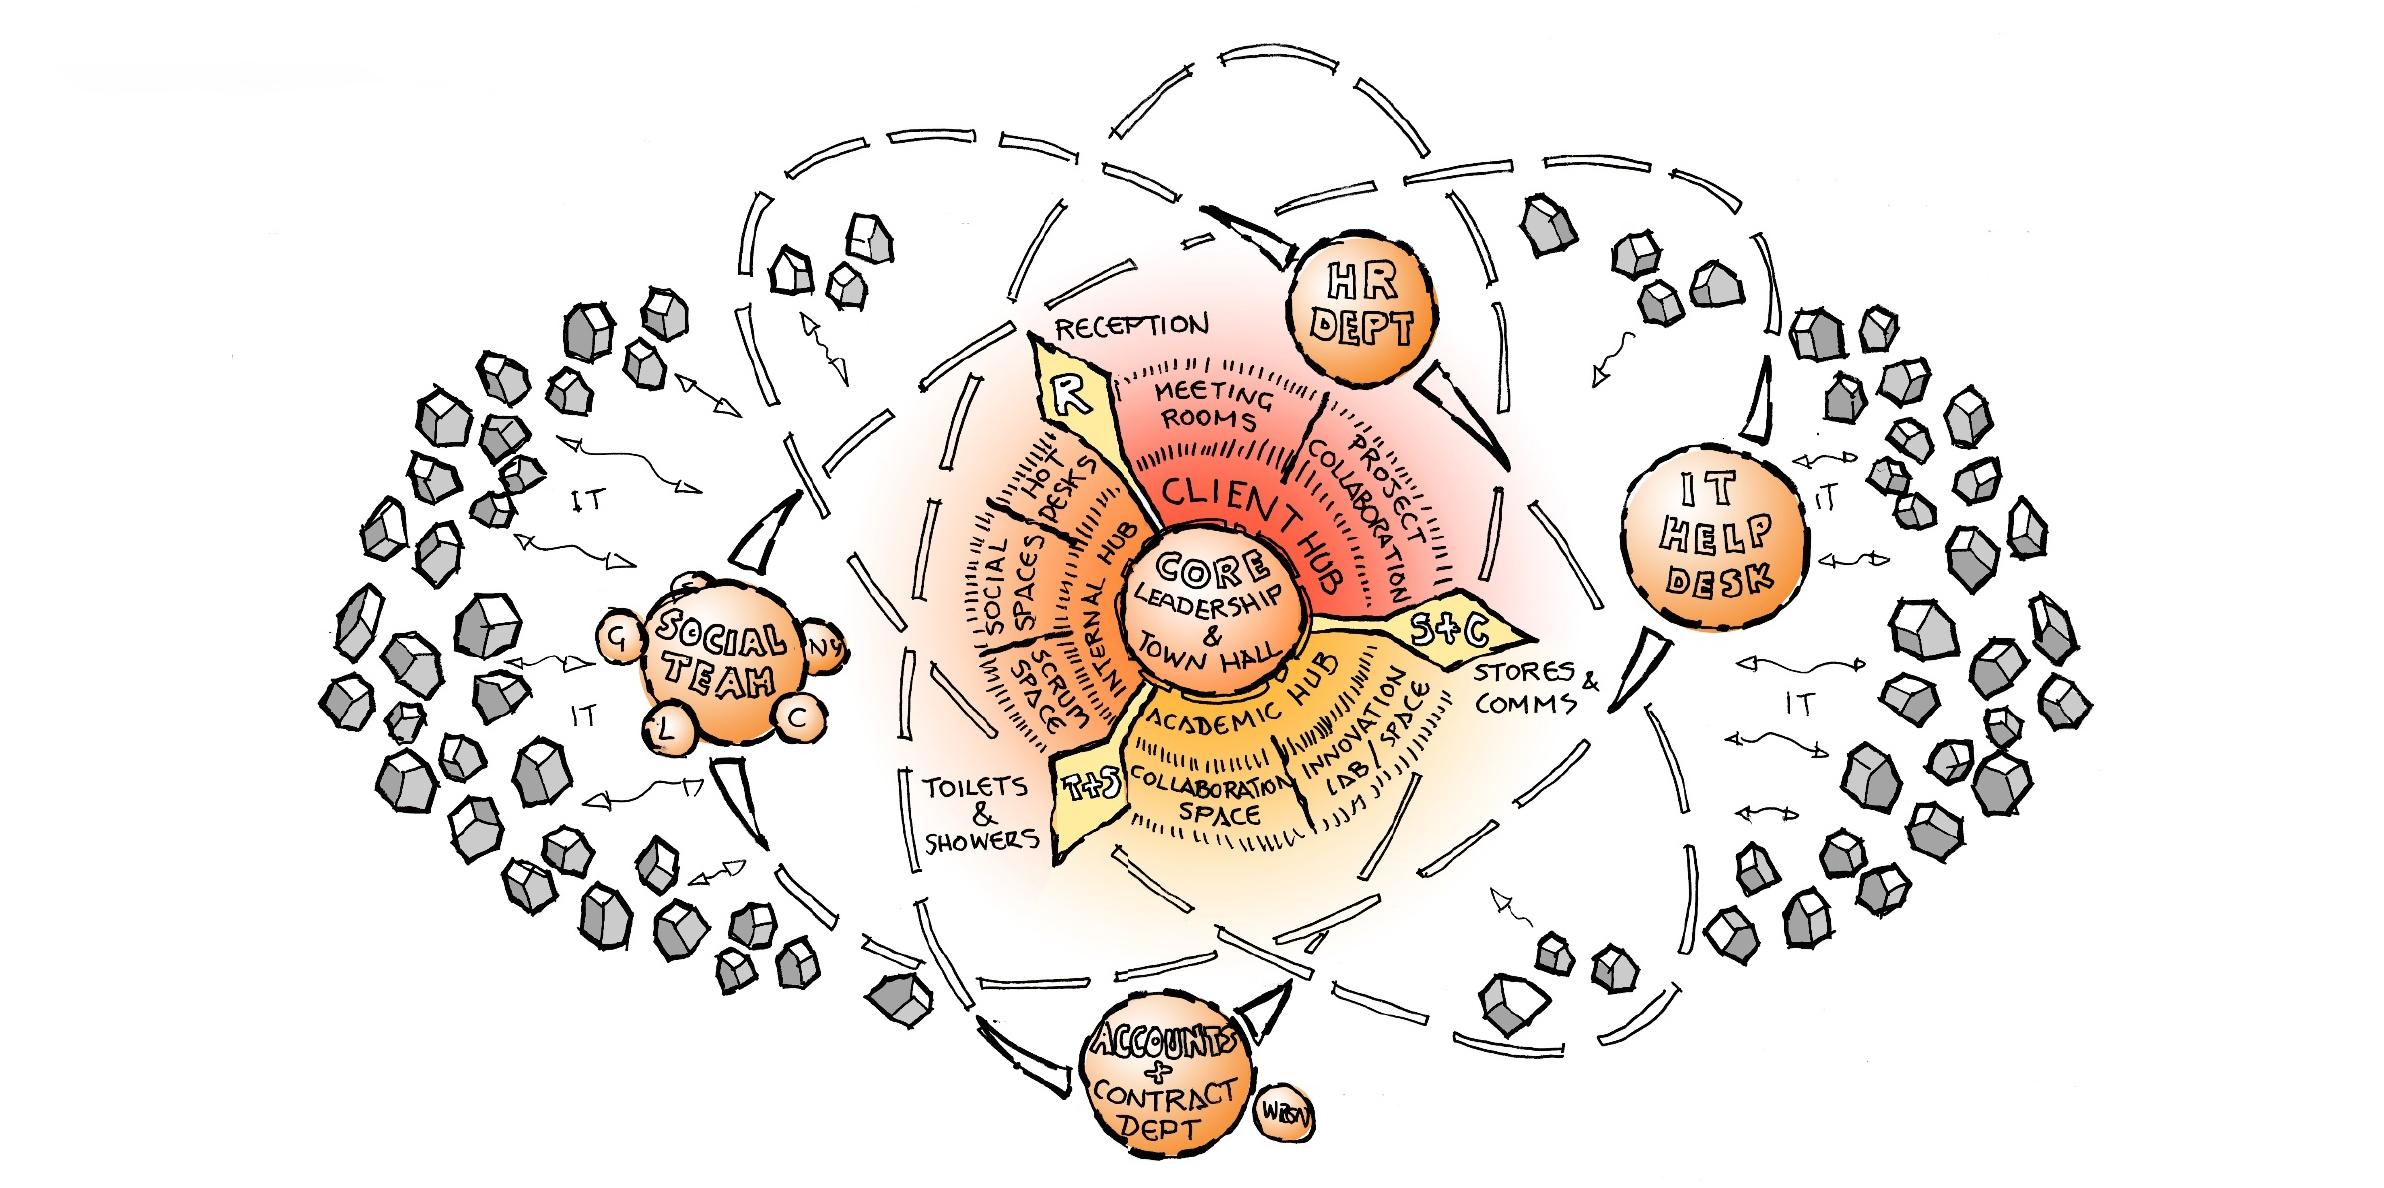 New System Of Work Diagram Crop For Website